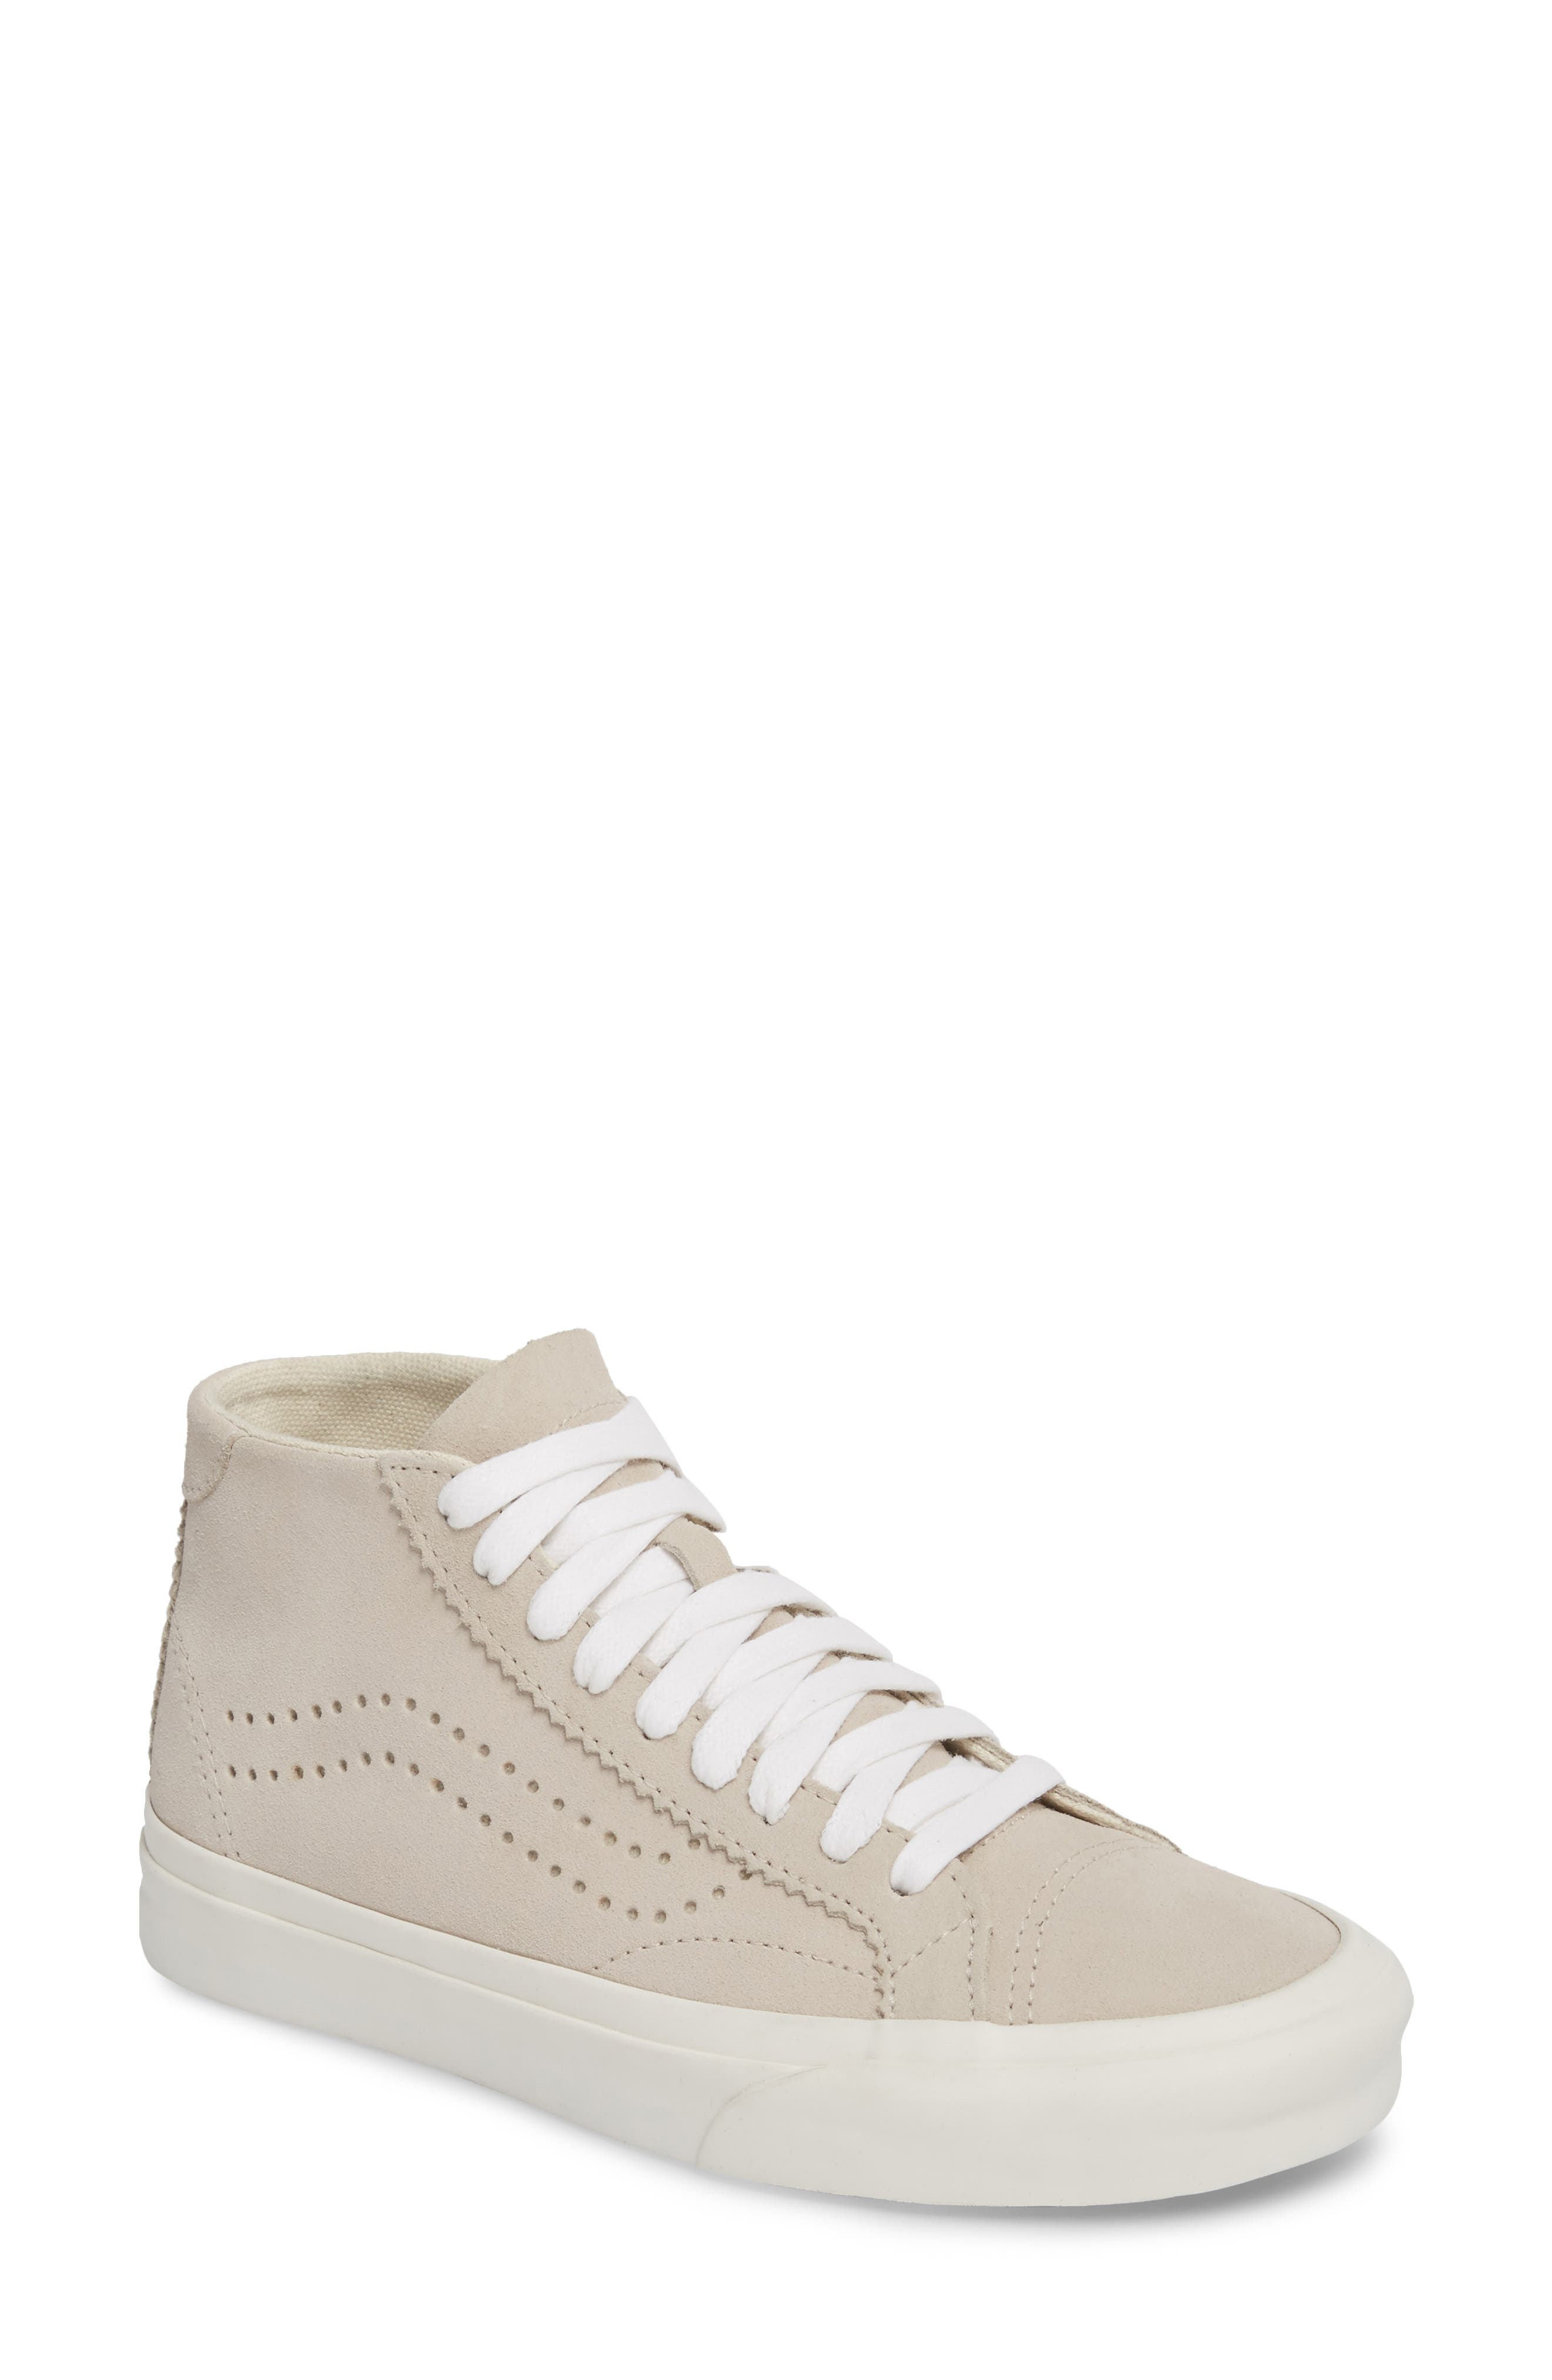 Court DX Mid Sneaker,                         Main,                         color, 040